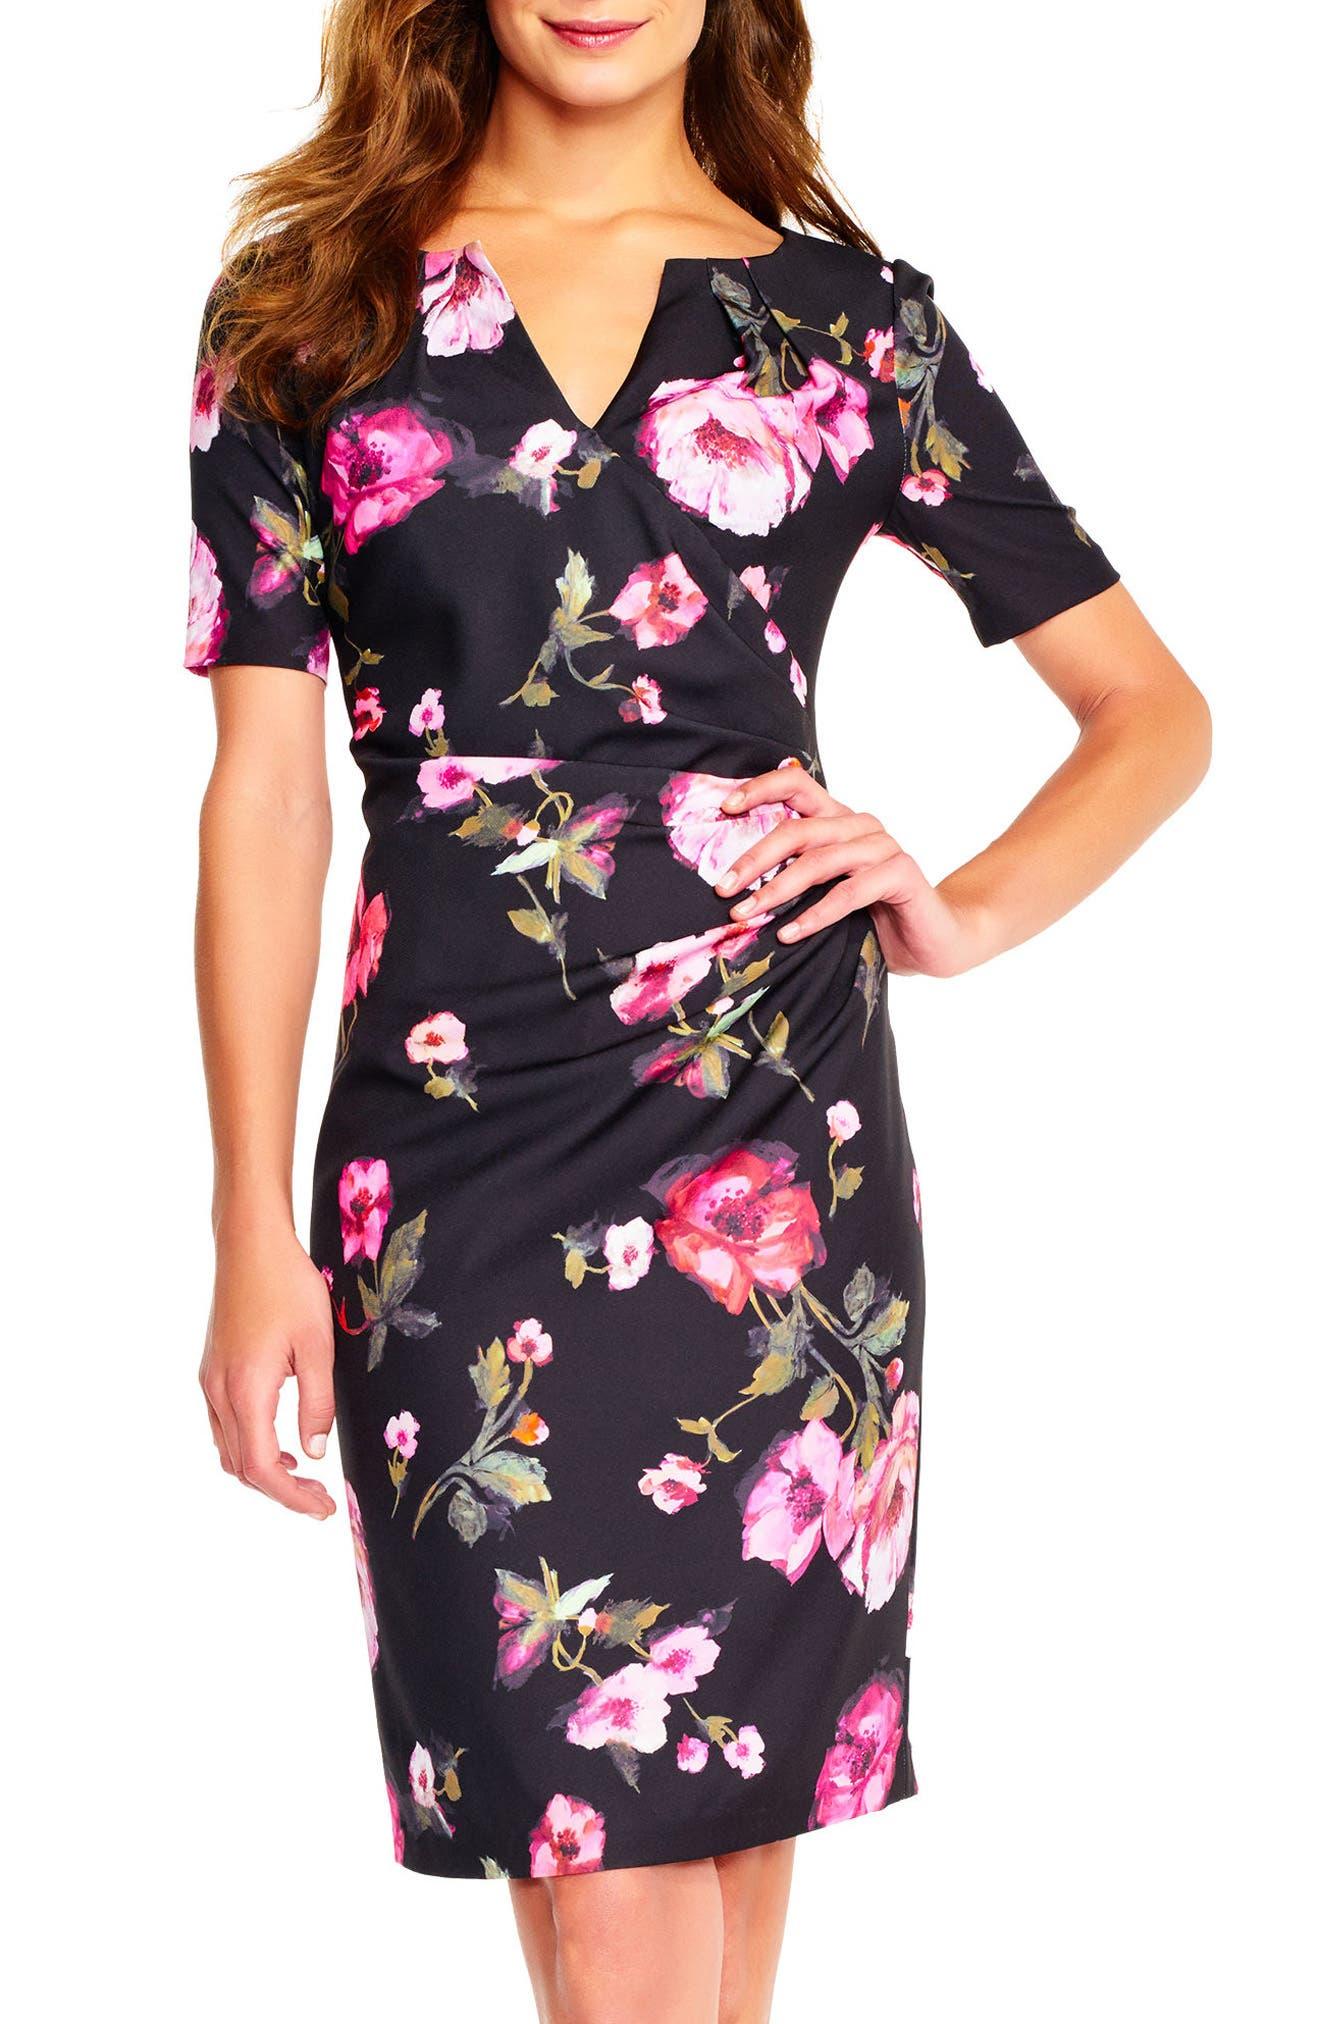 Adrianna Papell Autumn Rose Side Drape Sheath Dress